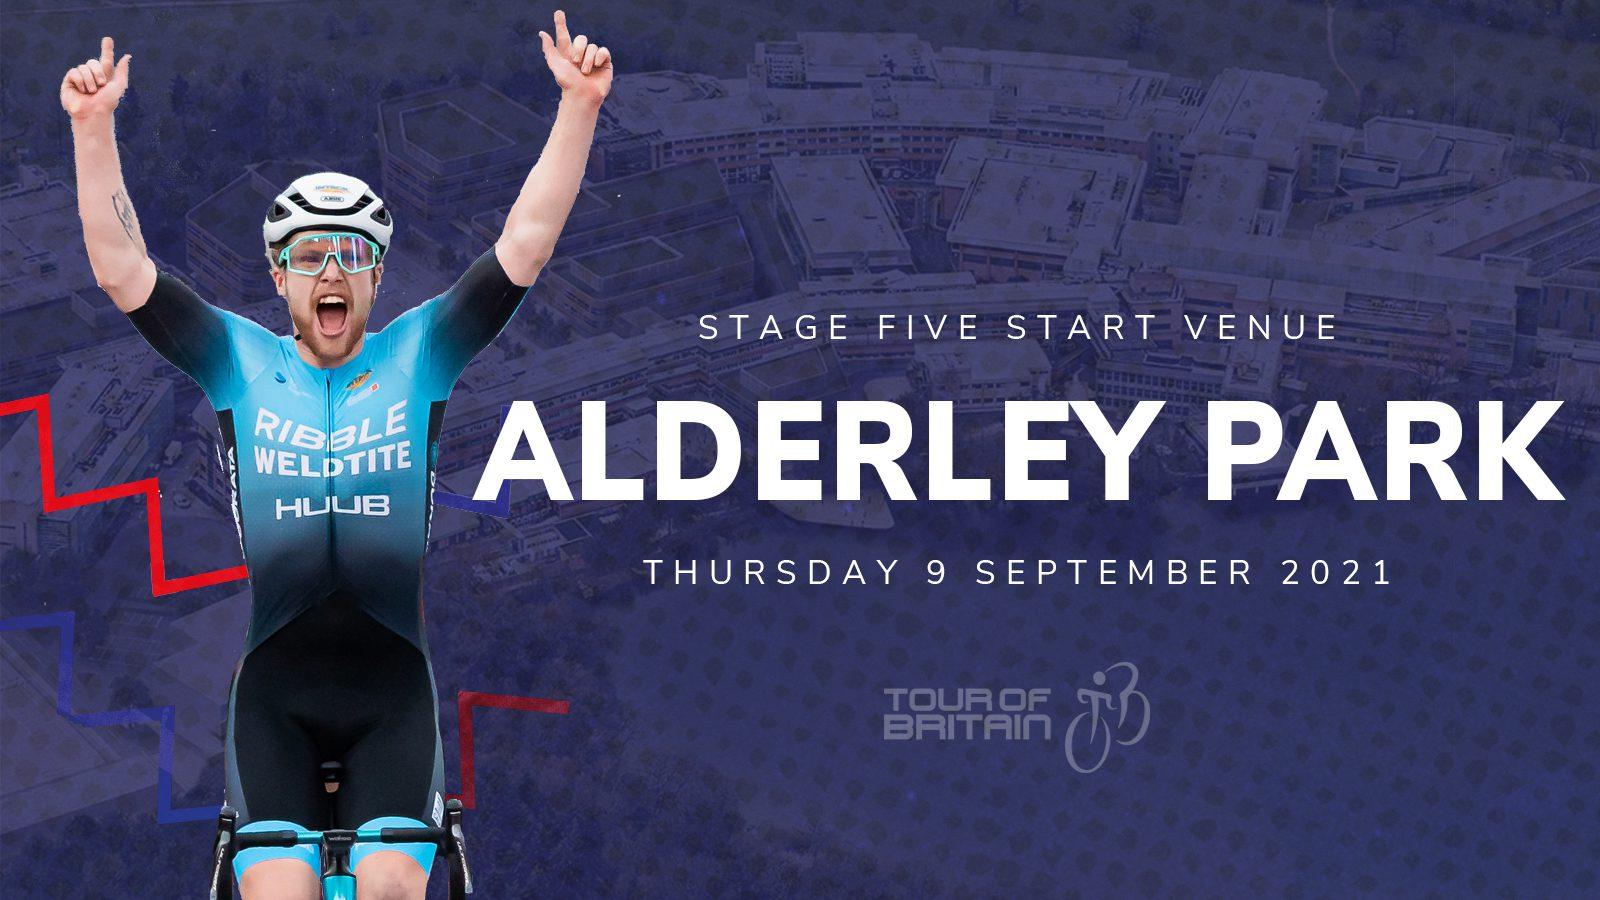 Tour of Britain Alderley Park